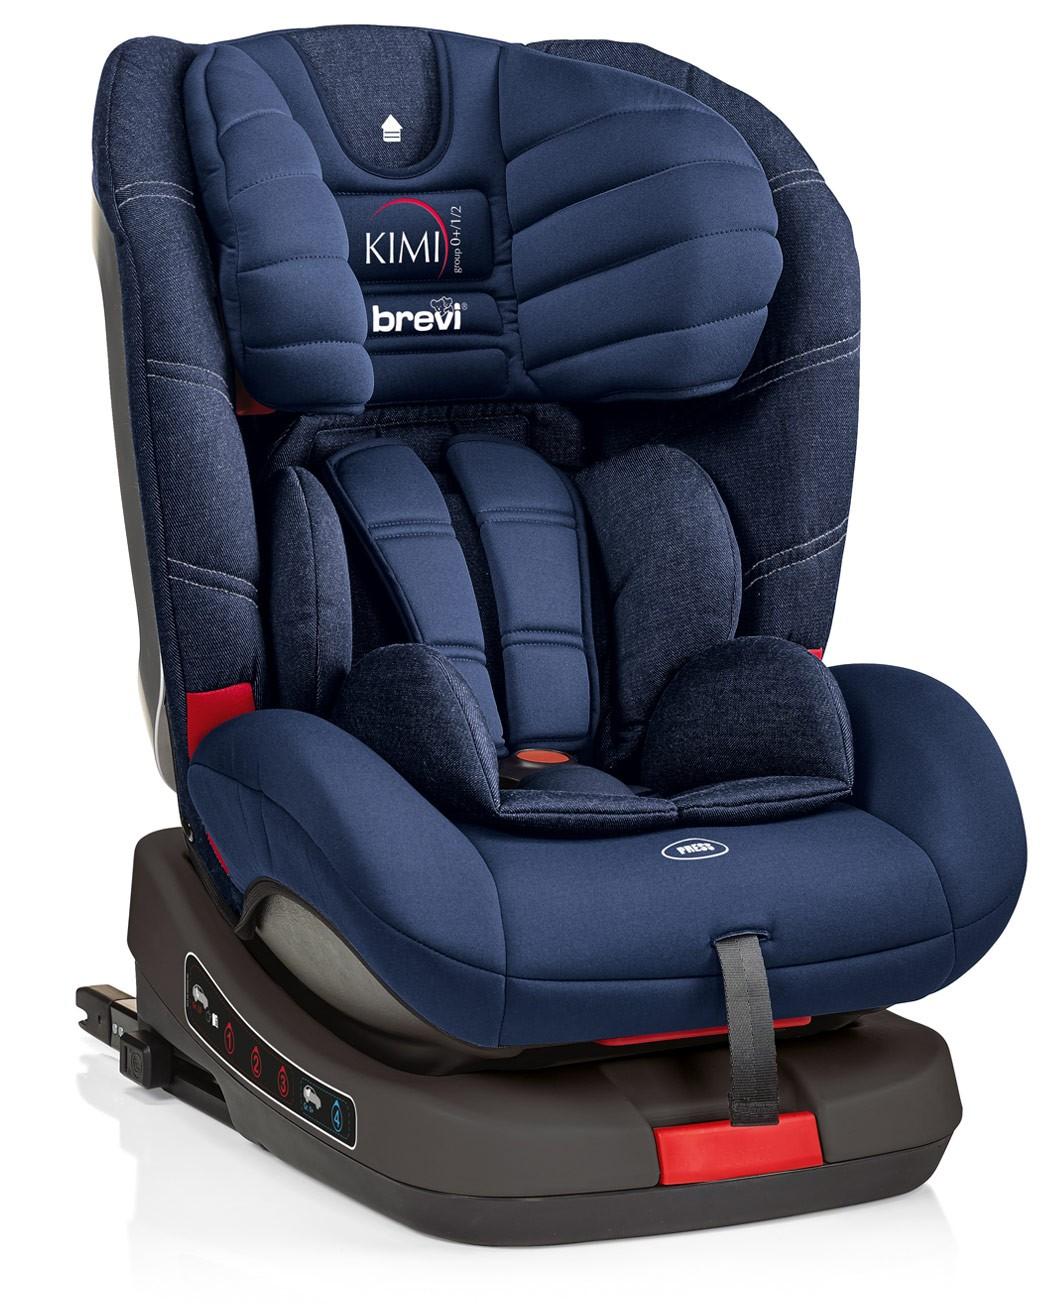 Siège-Auto Kimi Isofix Brevi Jeans